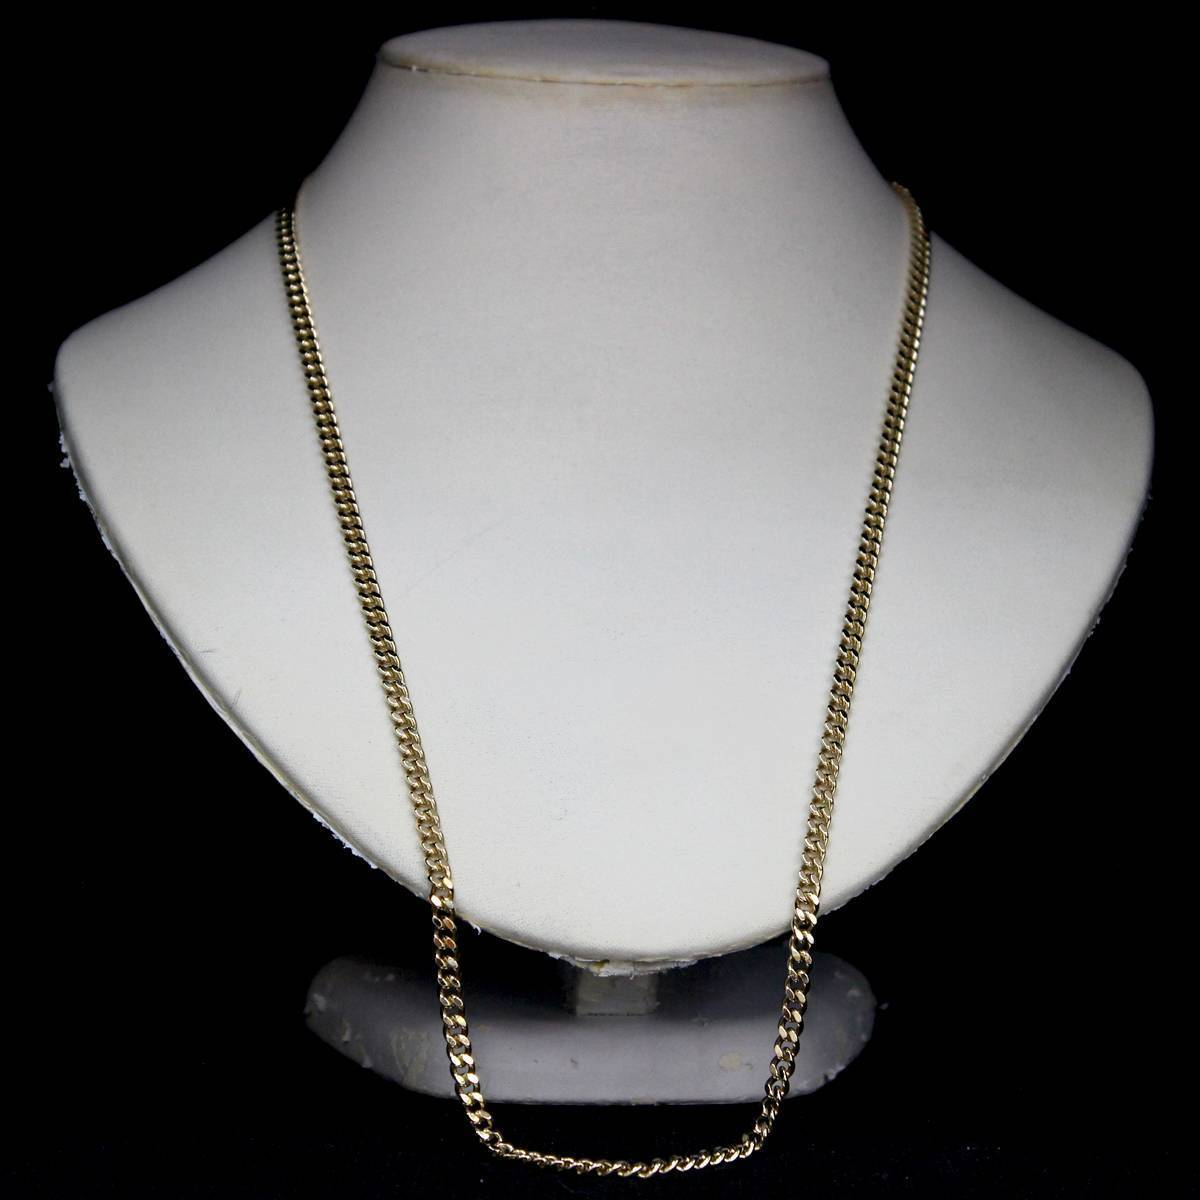 K18 18金 ゴールド 喜平 2面 ネックレス チェーン 66cm 41.3g KA 磨き仕上げ品 Aランク_画像4